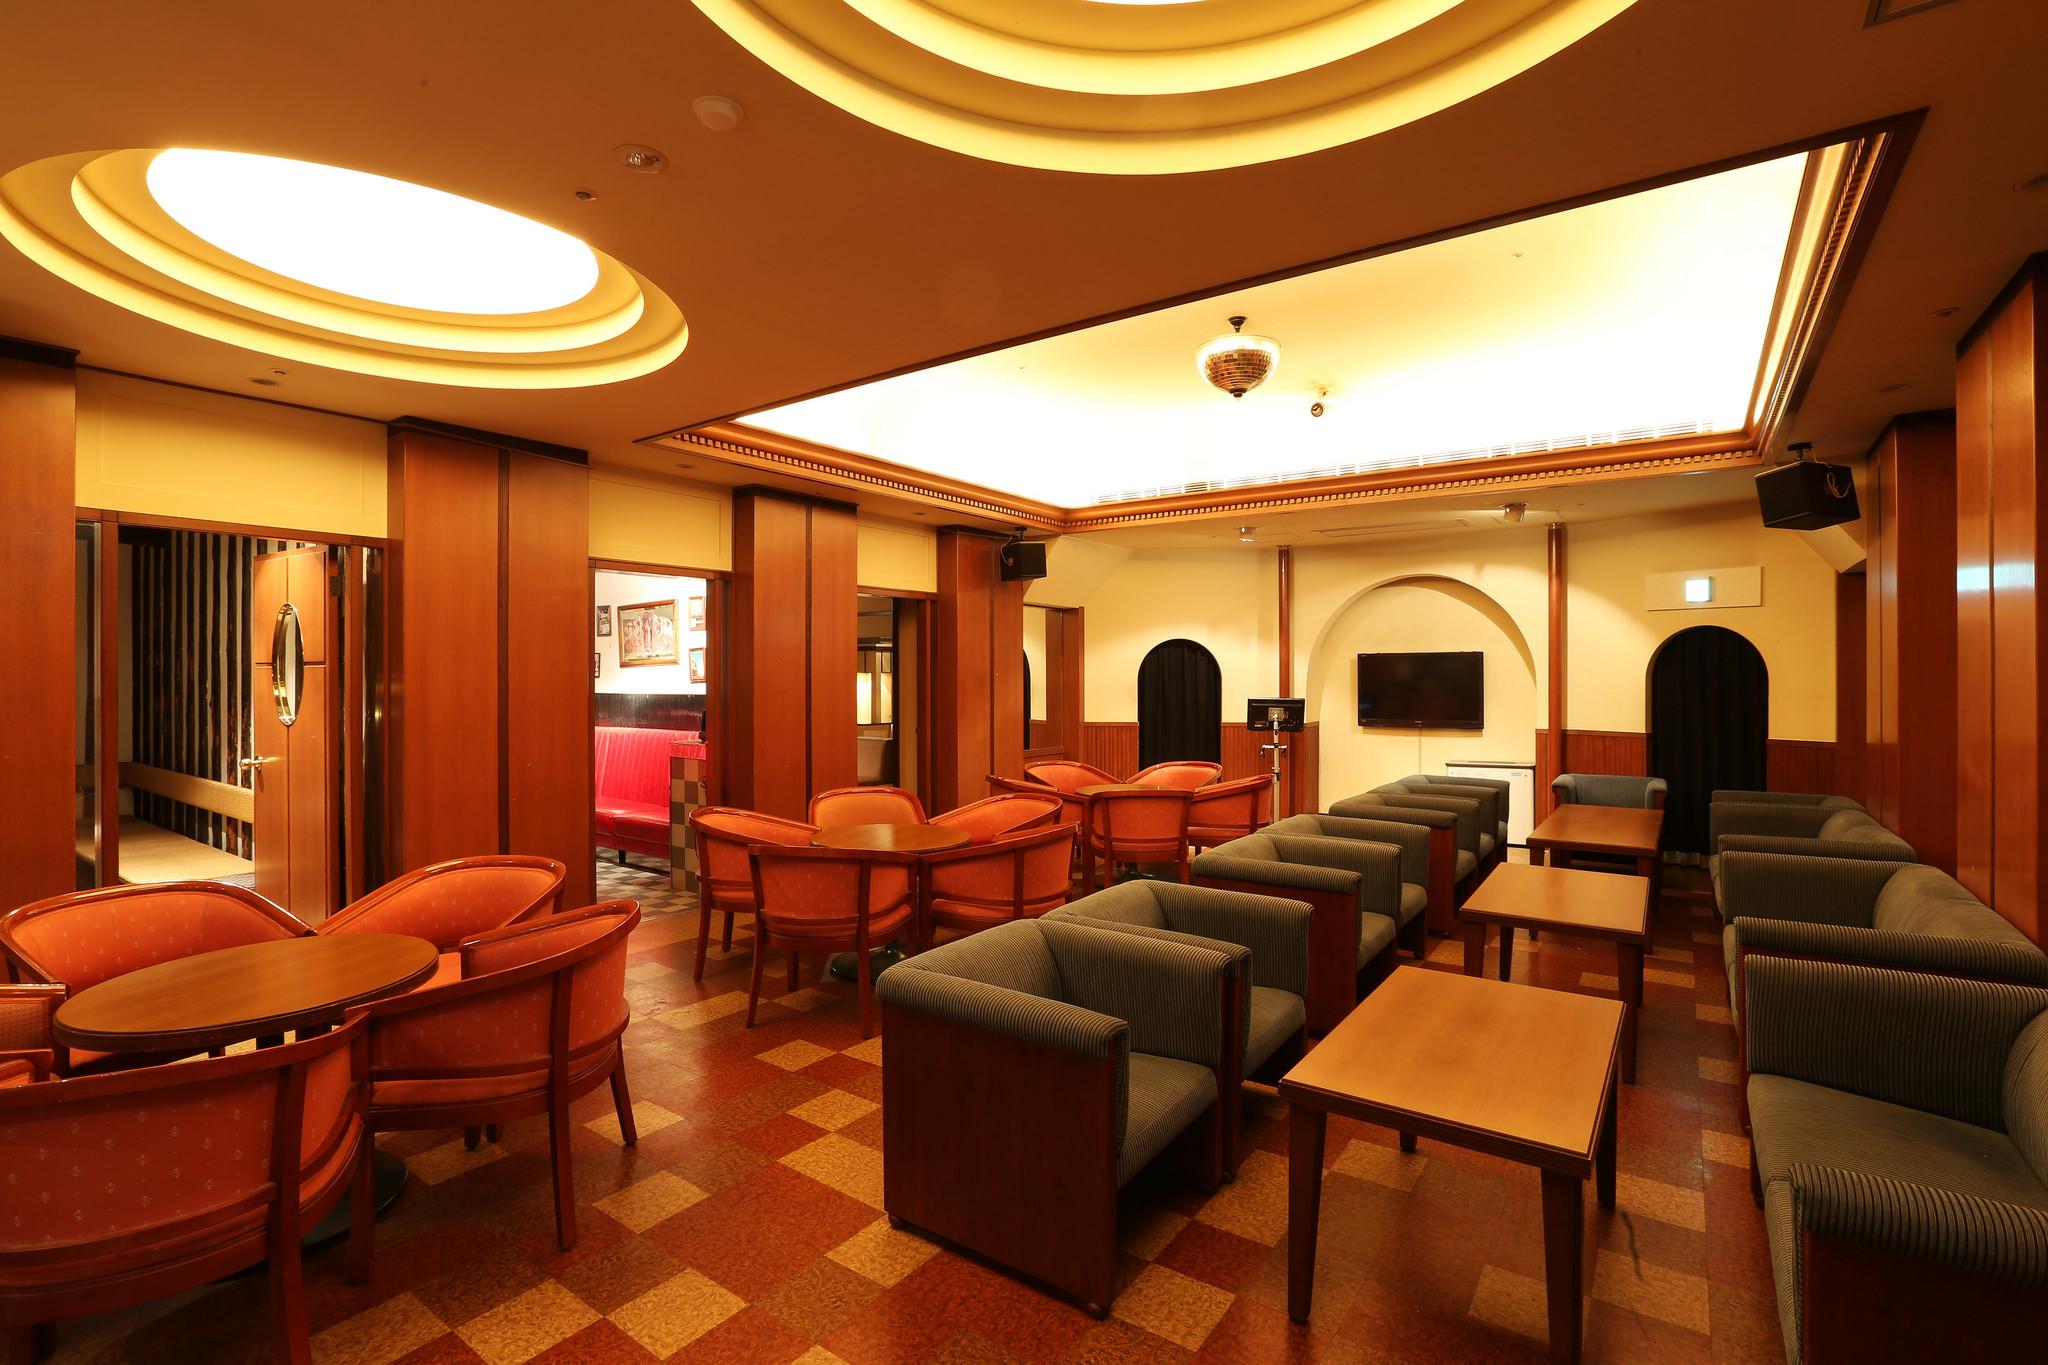 Karaoke Room - Nishimuraya Hotel Shogetsutei - Kinosaki Onsen Ryokan